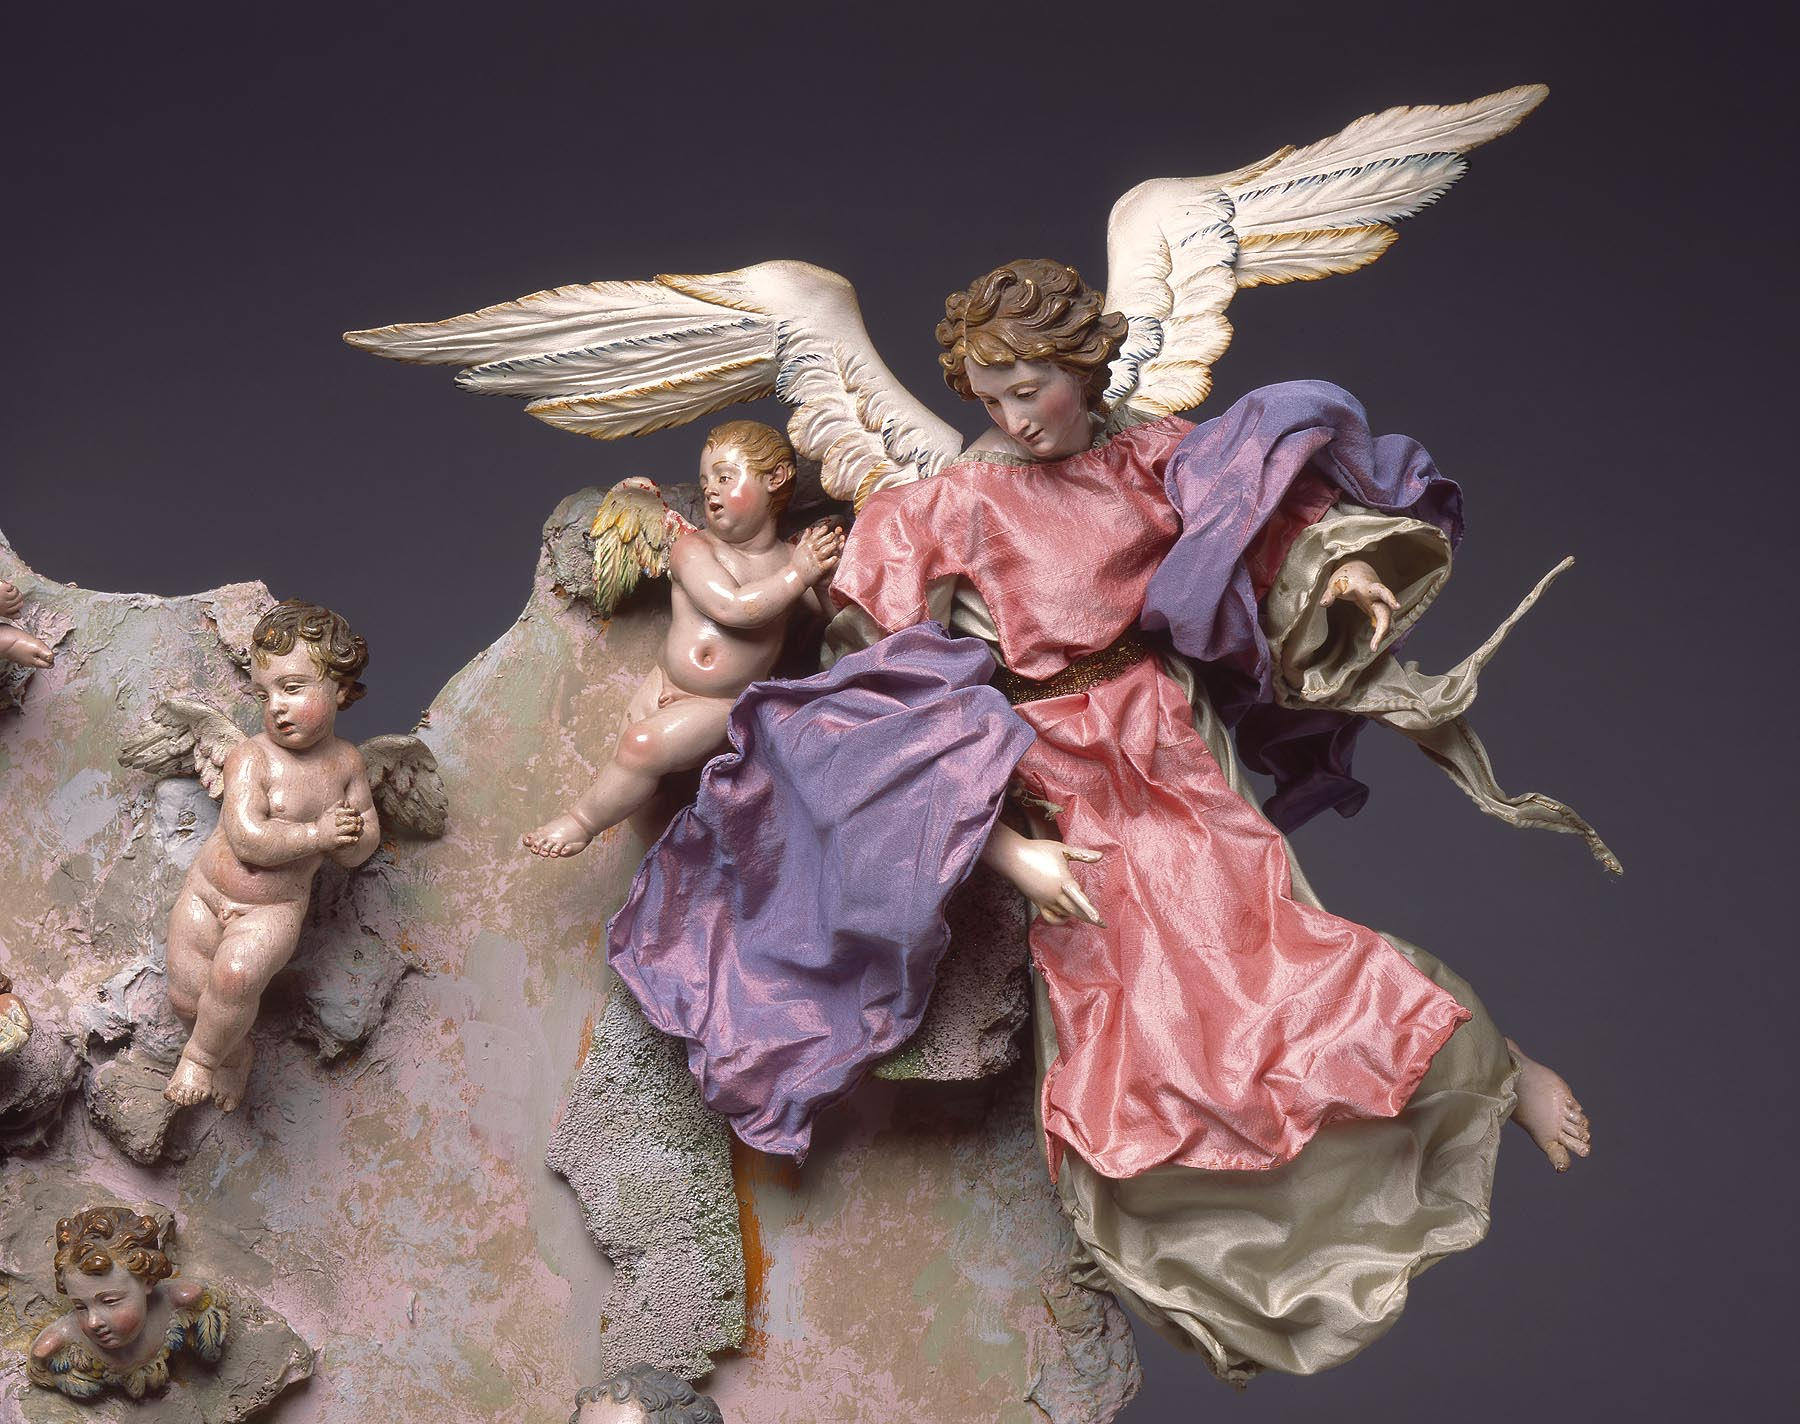 Naples Italy, Nativity Scene (Crèche), mid 1700s. Milwaukee Art Museum, Gift of Loretta Howard Sturgis, M2006.9.1-.20. Photo by John R. Glembin.